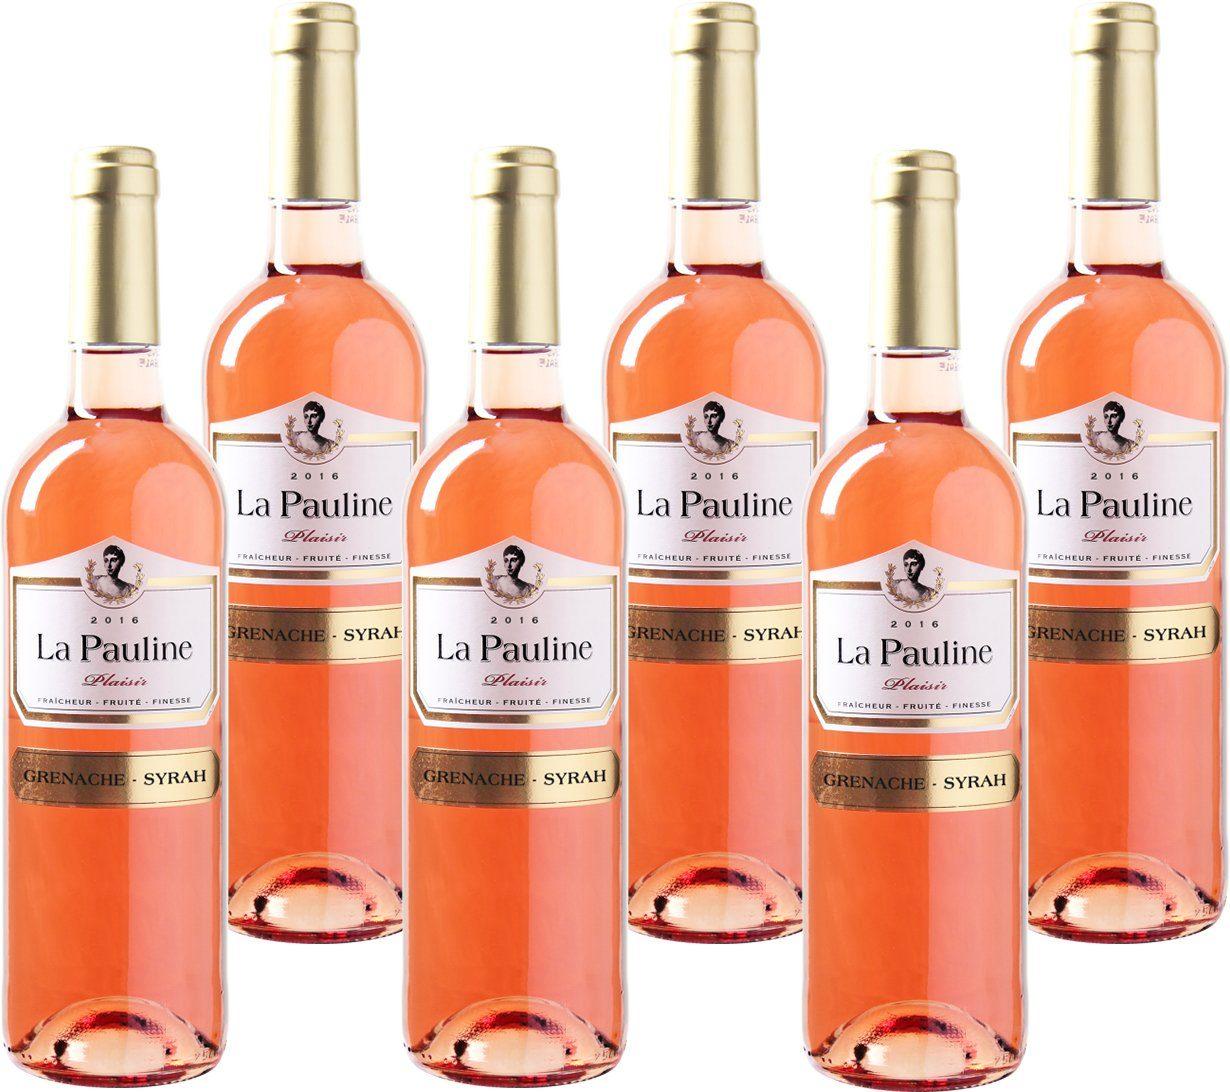 Roséwein aus Frankreich, 12,5 Vol.-%, 4,5 l »2016 La Pauline«